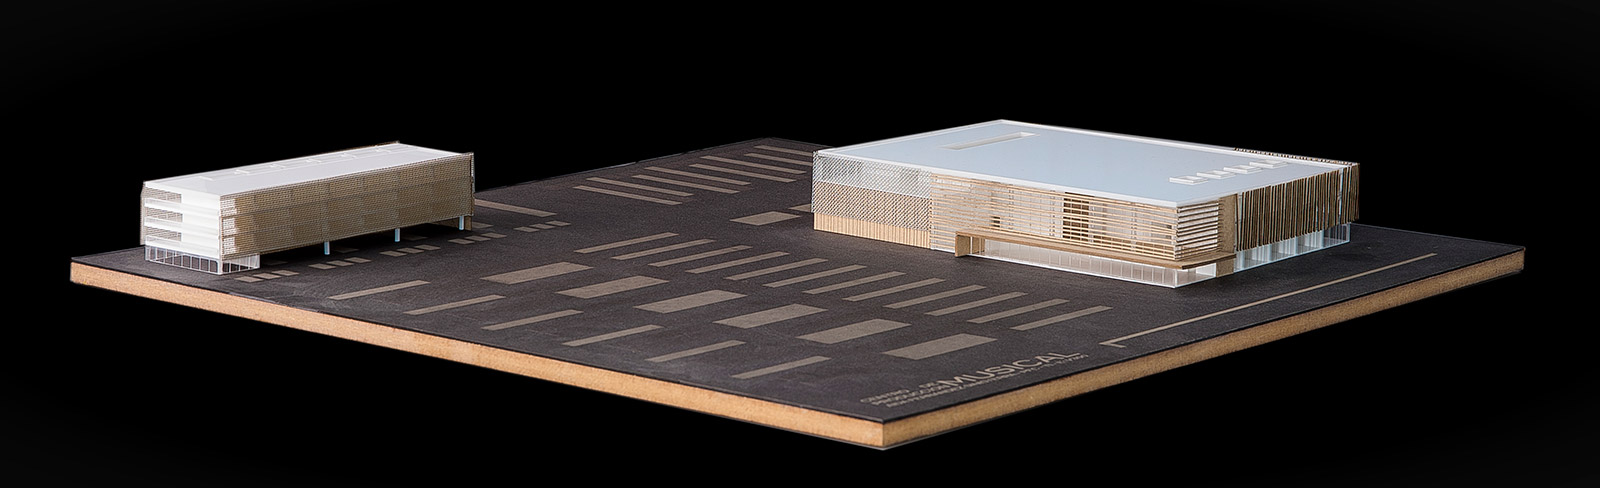 maqueta-arquitectura-architecture-model-tfg-etsav-upv-centro-de-produccion-musical-arquimaqueta-valencia-2